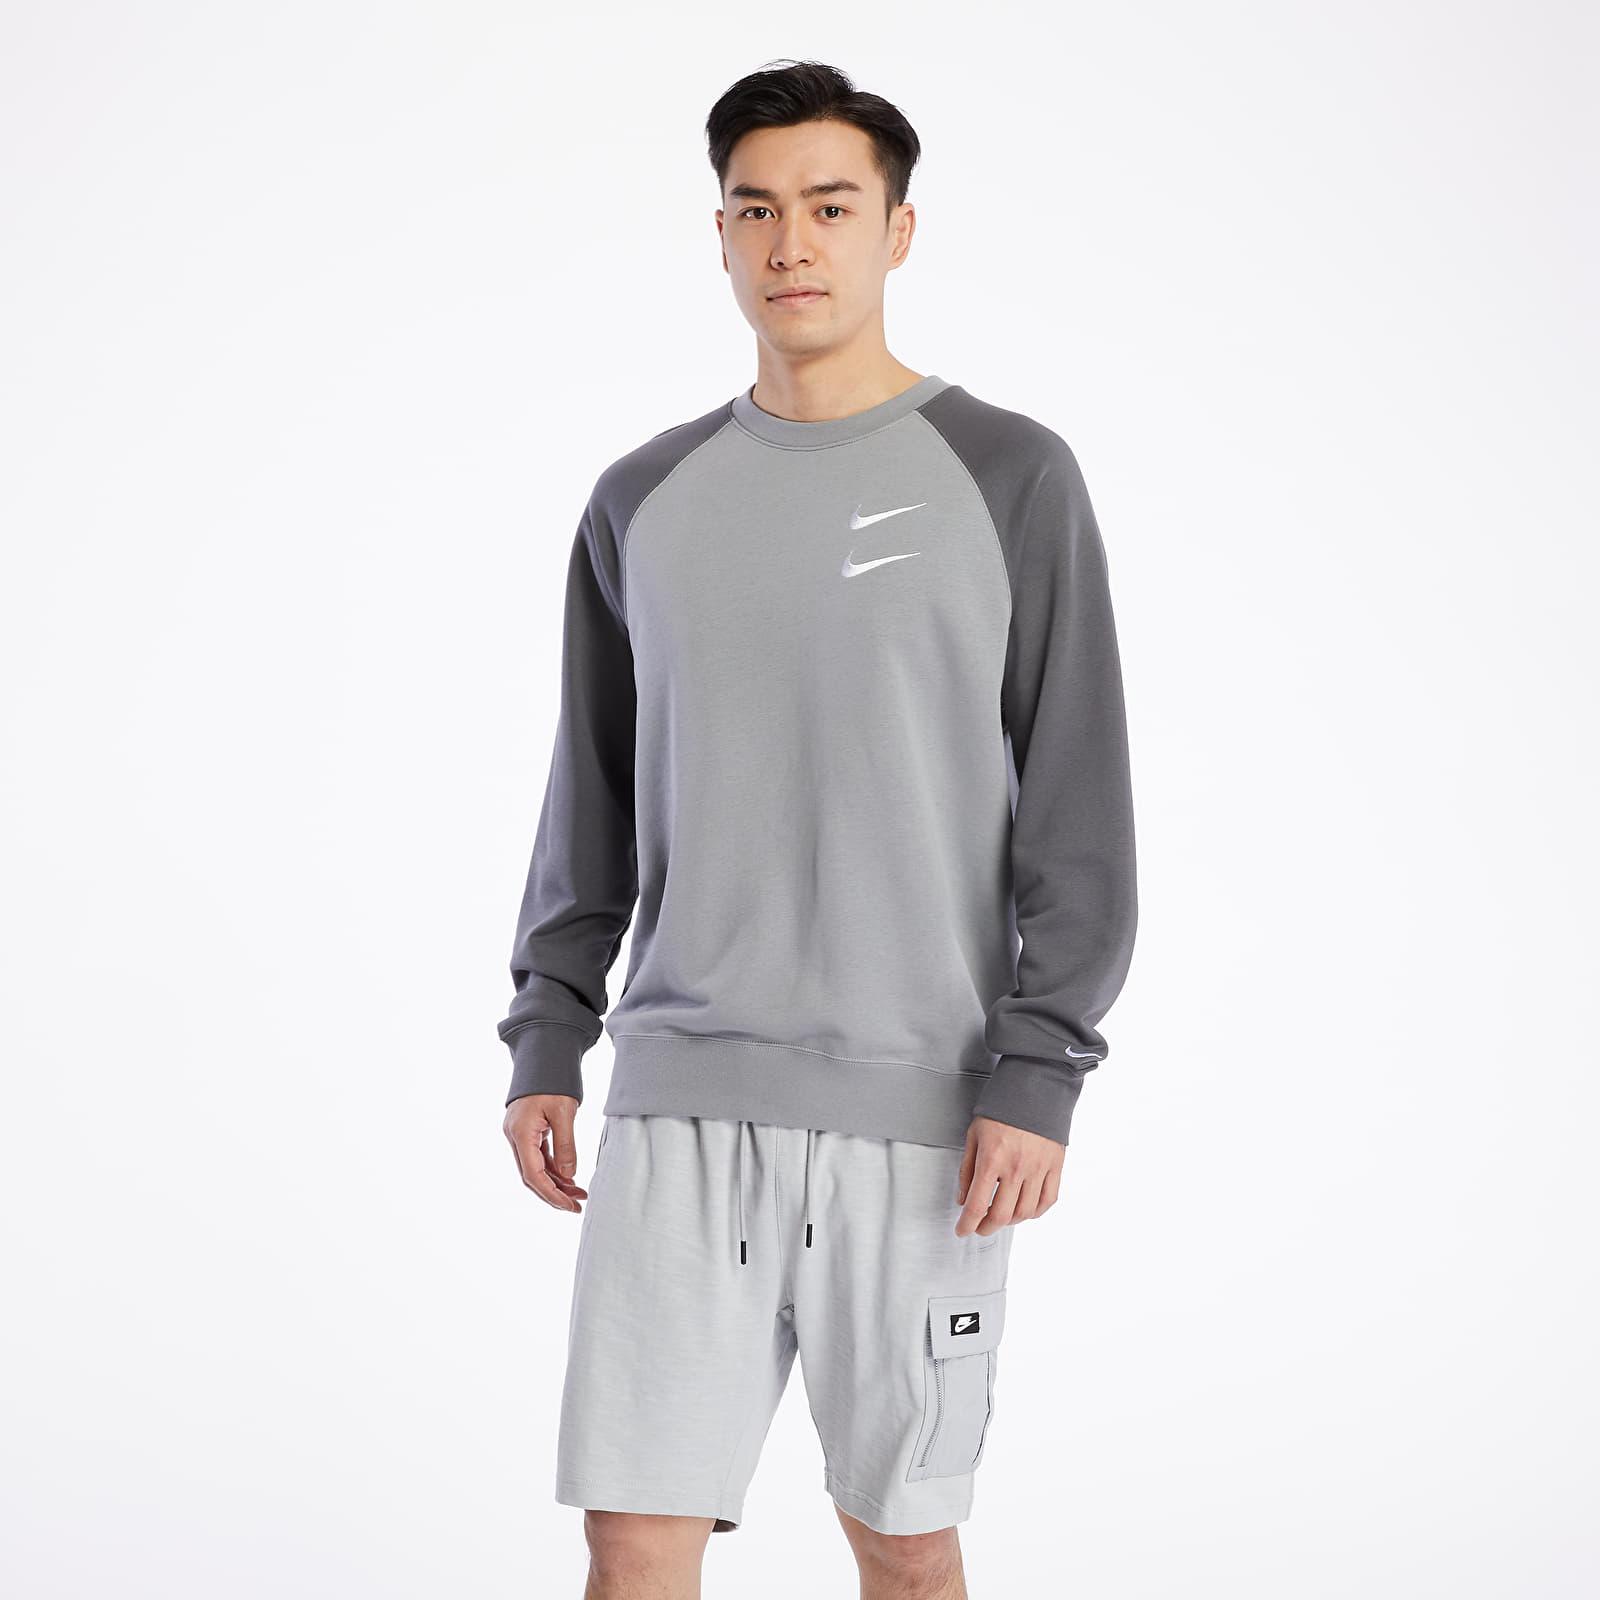 Mikiny a svetry Nike Sportswear Swoosh Ft Crewneck Particle Grey/ Iron Grey/ White